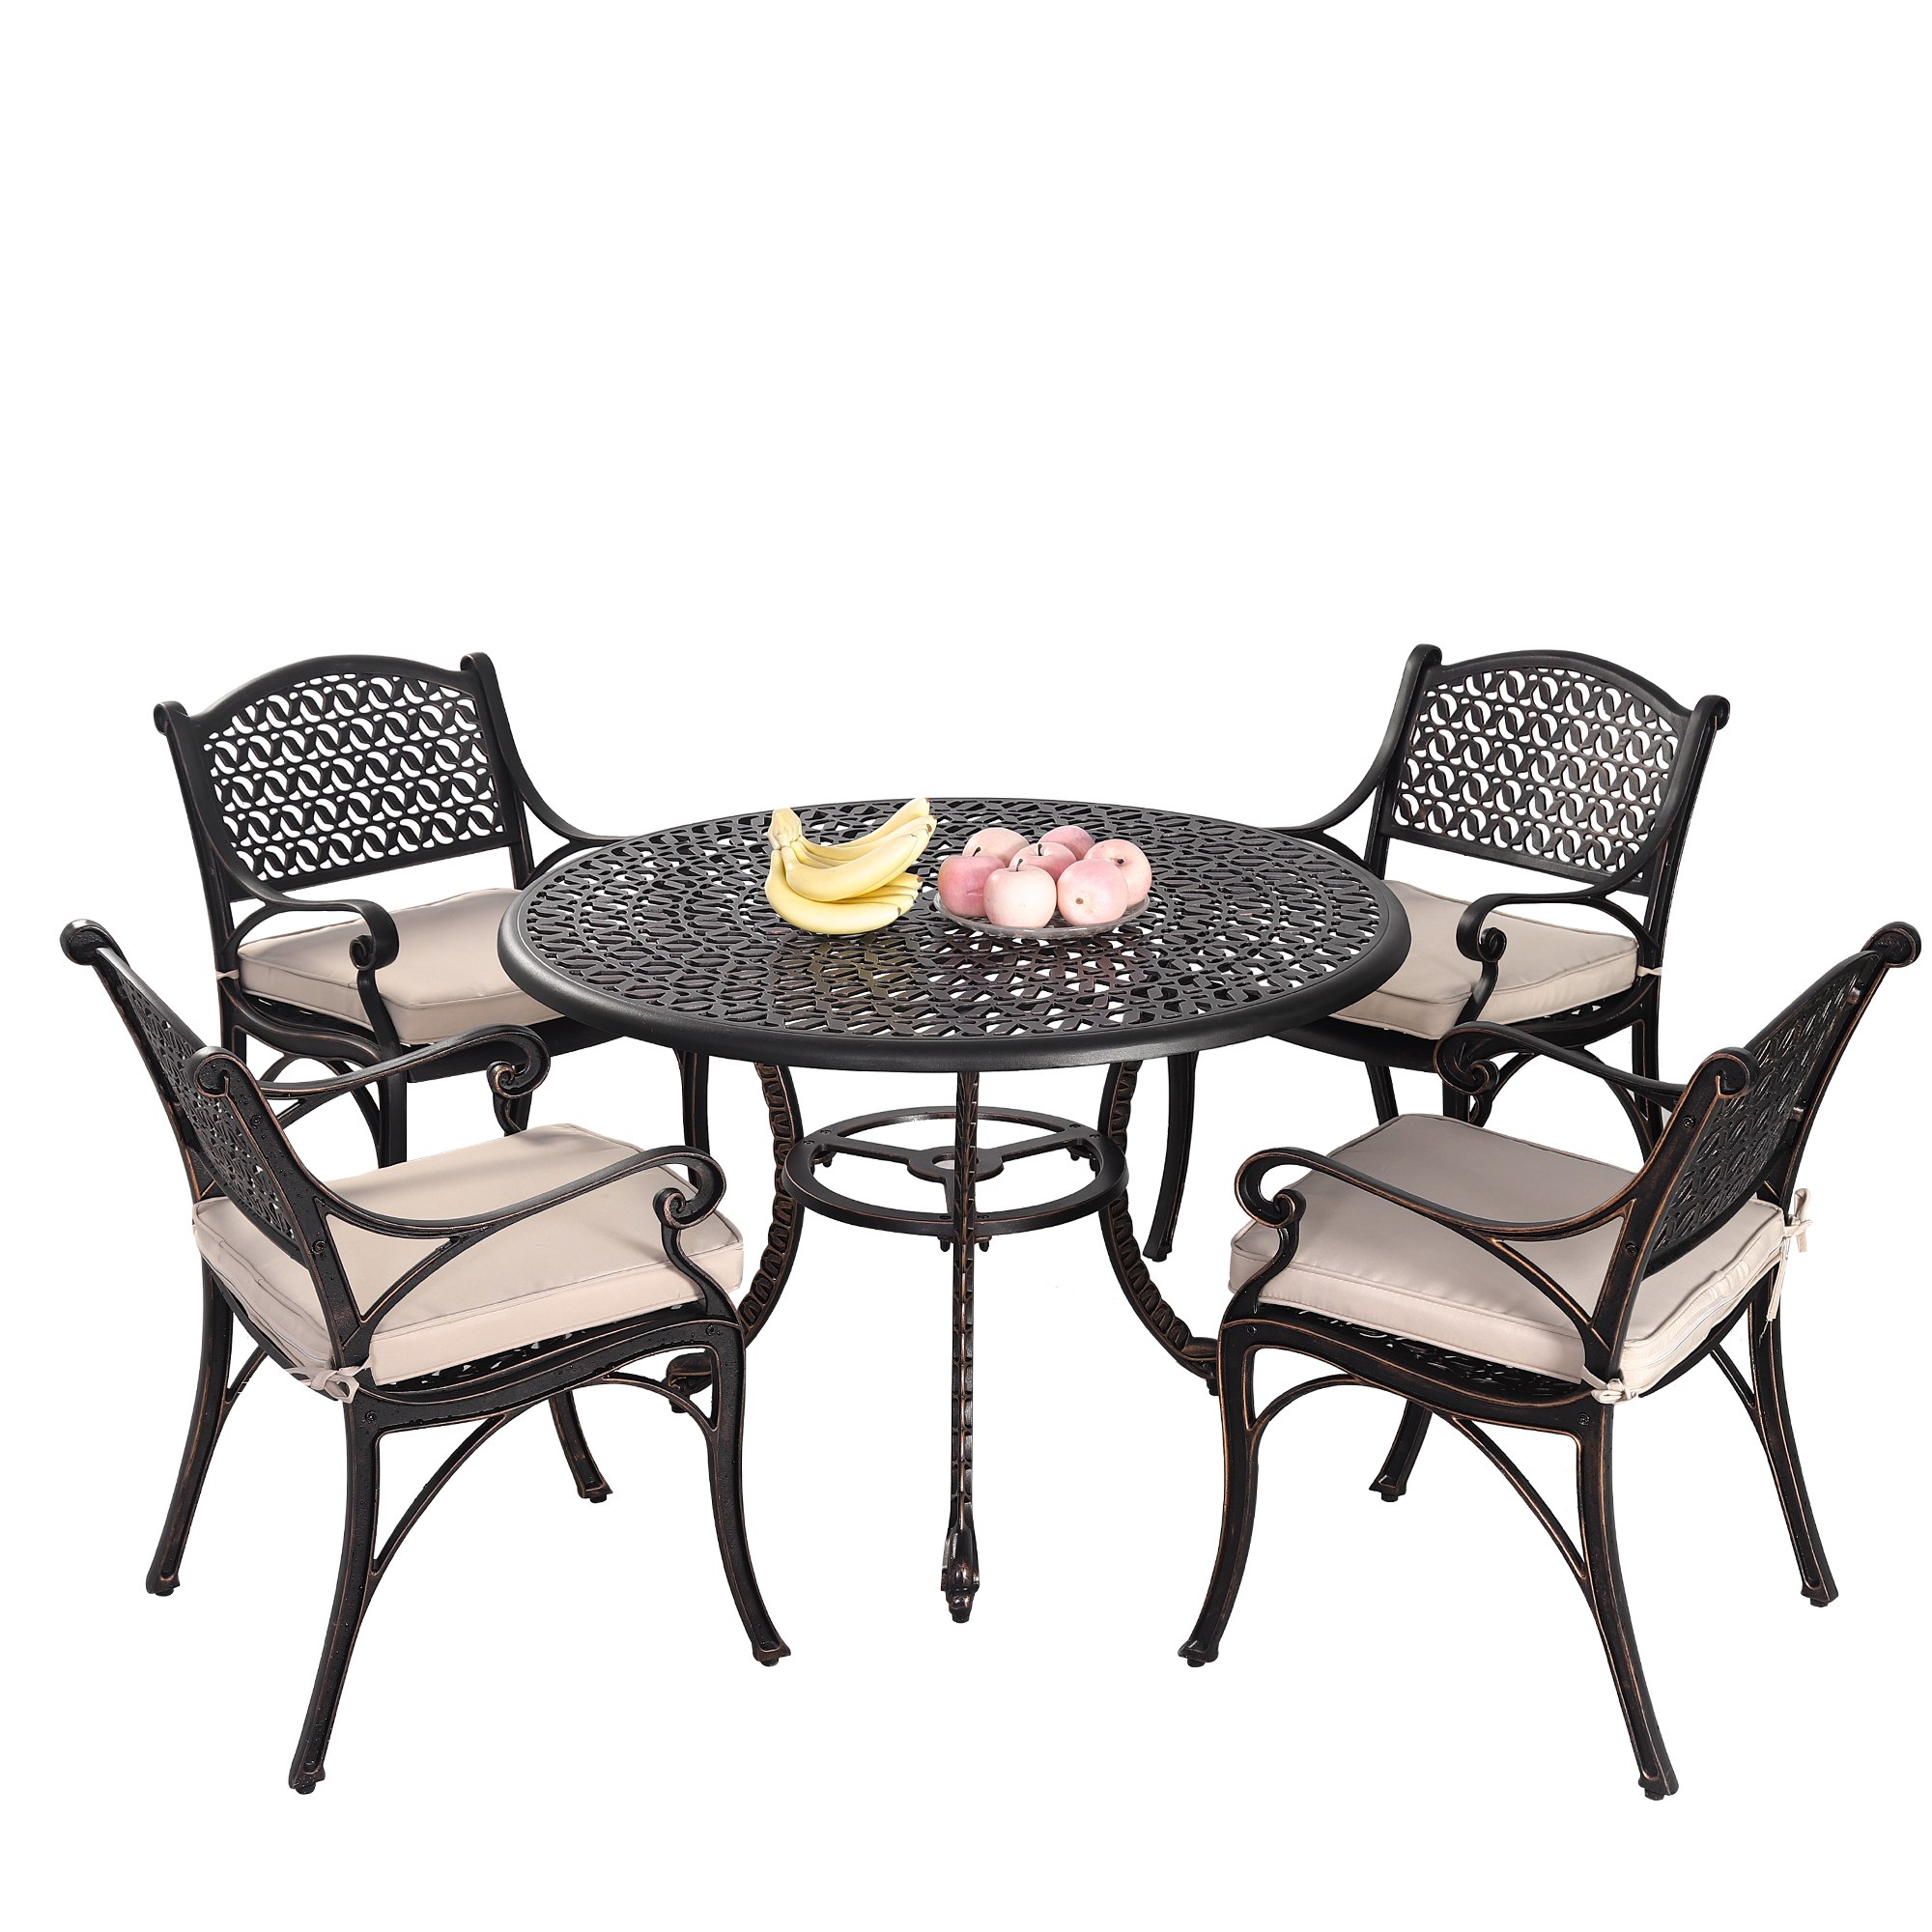 Cast Iron Outdoor 5 Piece Prato Cast Aluminium Dining Table Chair Set Temple Webster